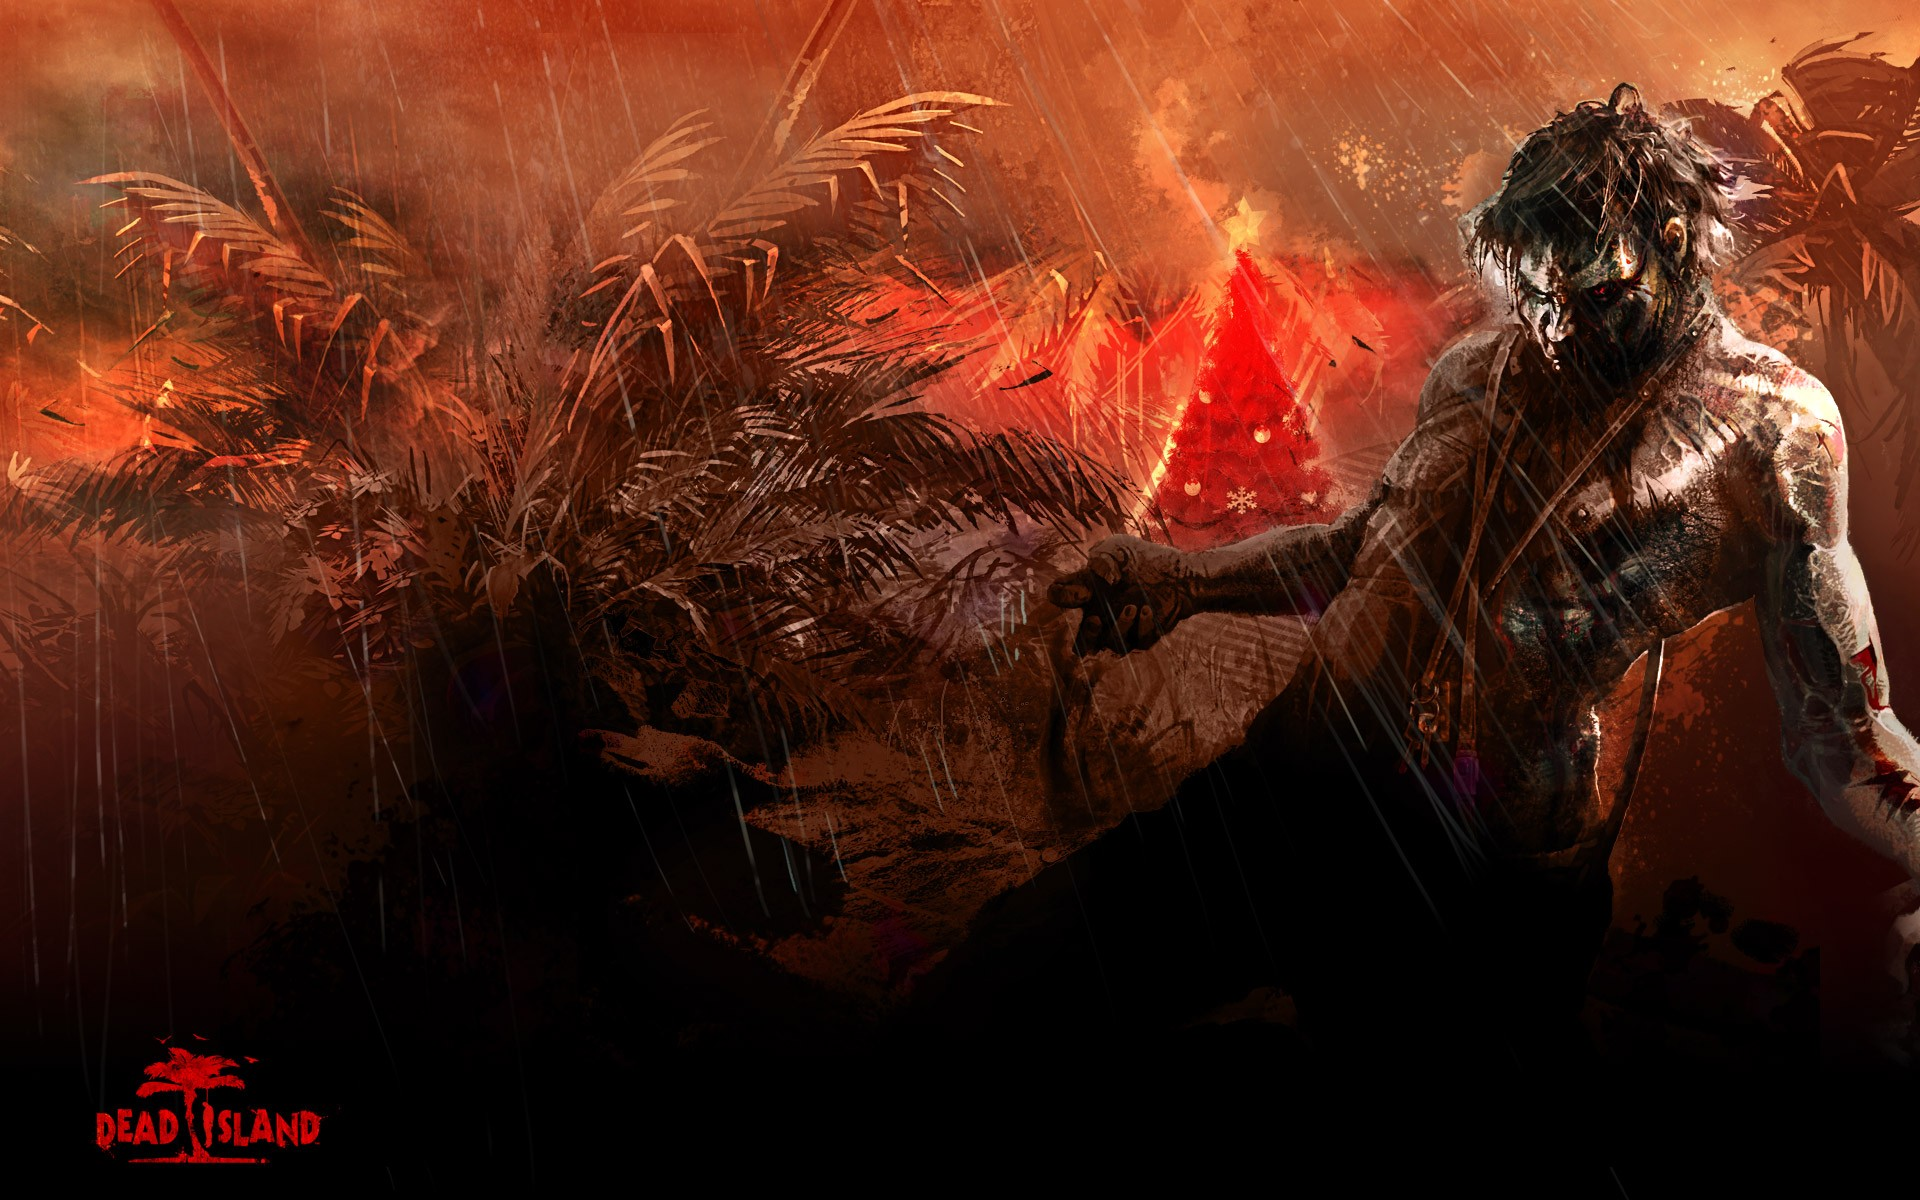 Video Game - Dead Island Wallpaper